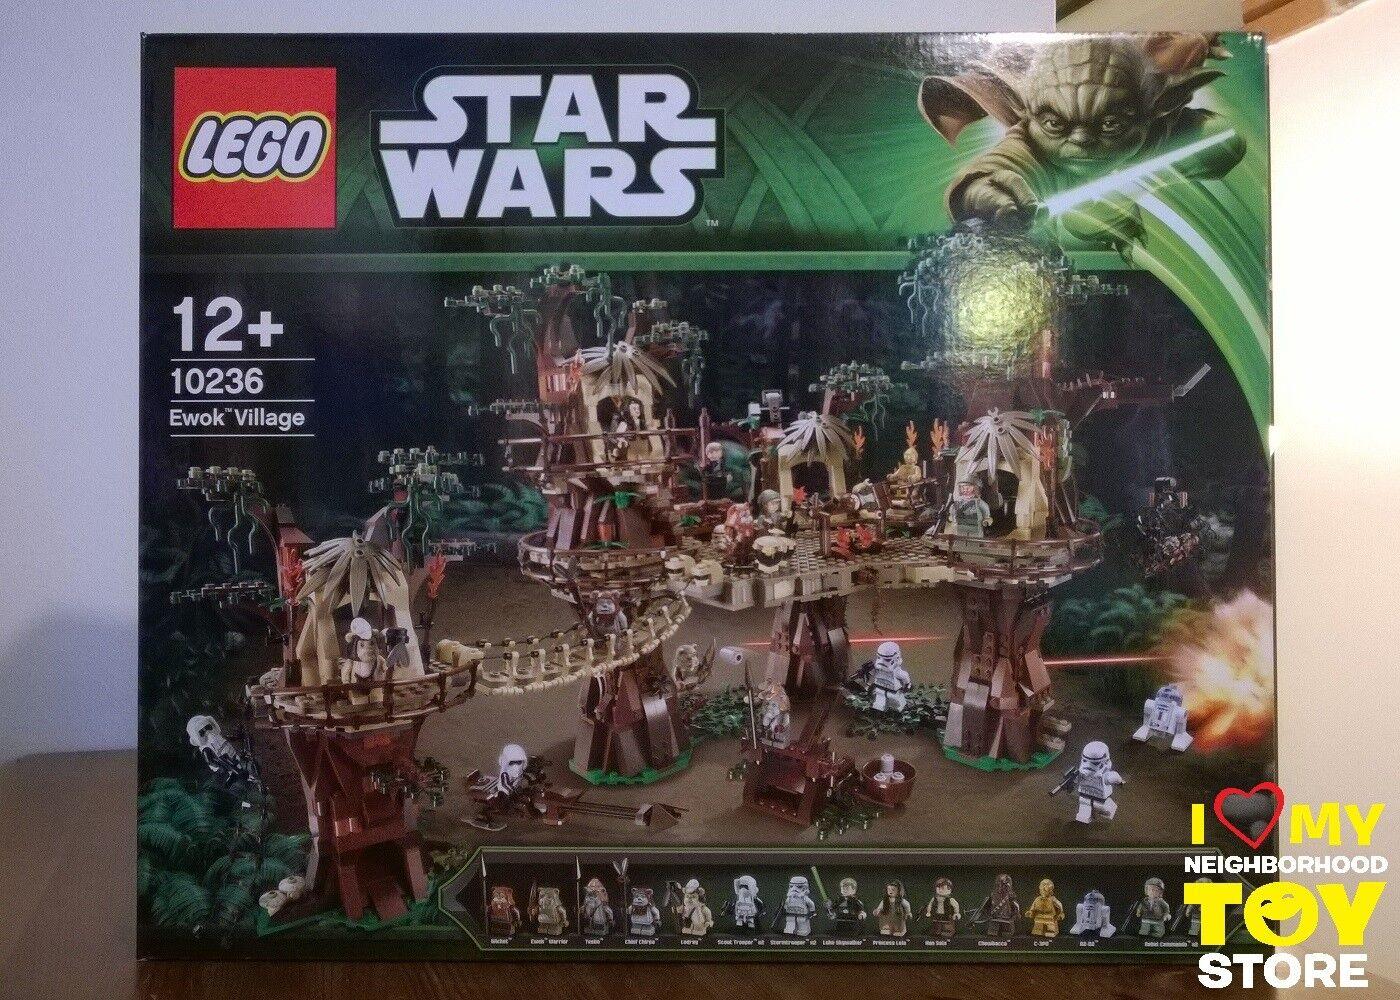 RETIrojo - LEGO 10236 UCS STAR WARS™ VILLAGGIO DEGLI EWOK™ VILLAGE (2013) - NISB